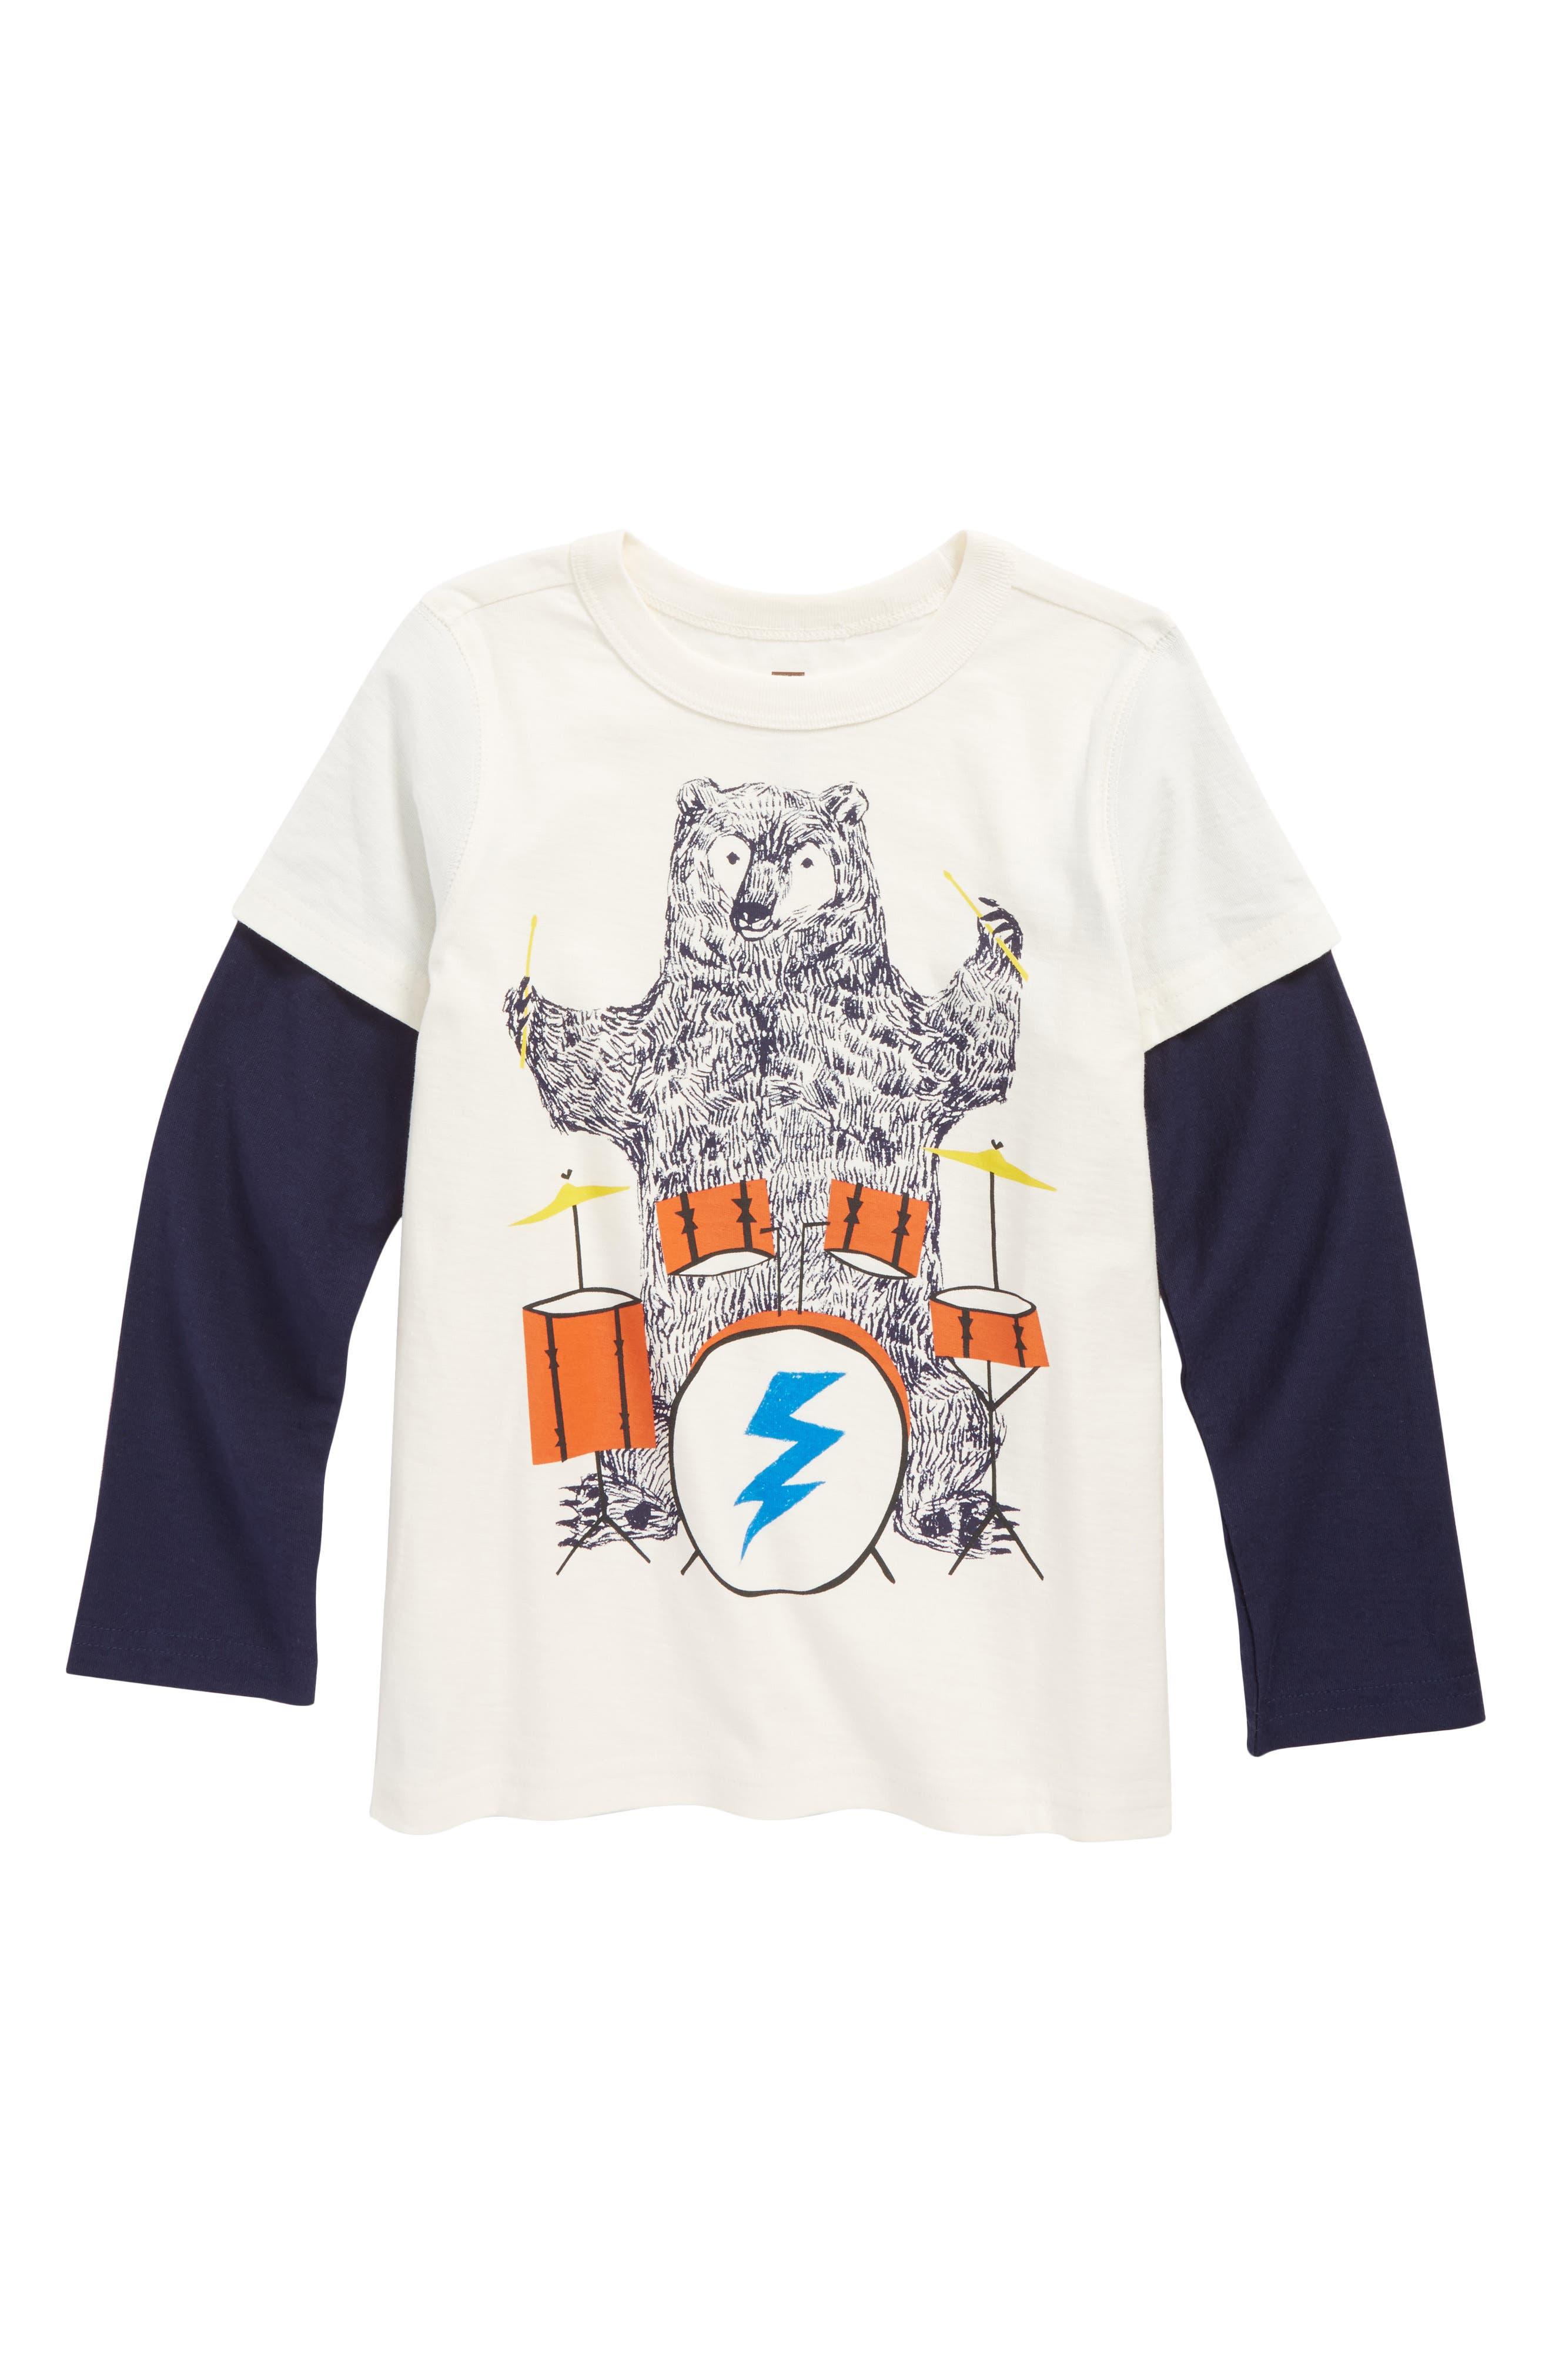 Main Image - Tea Collection Backbeat Bear Layer T-Shirt (Toddler Boys & Little Boys)